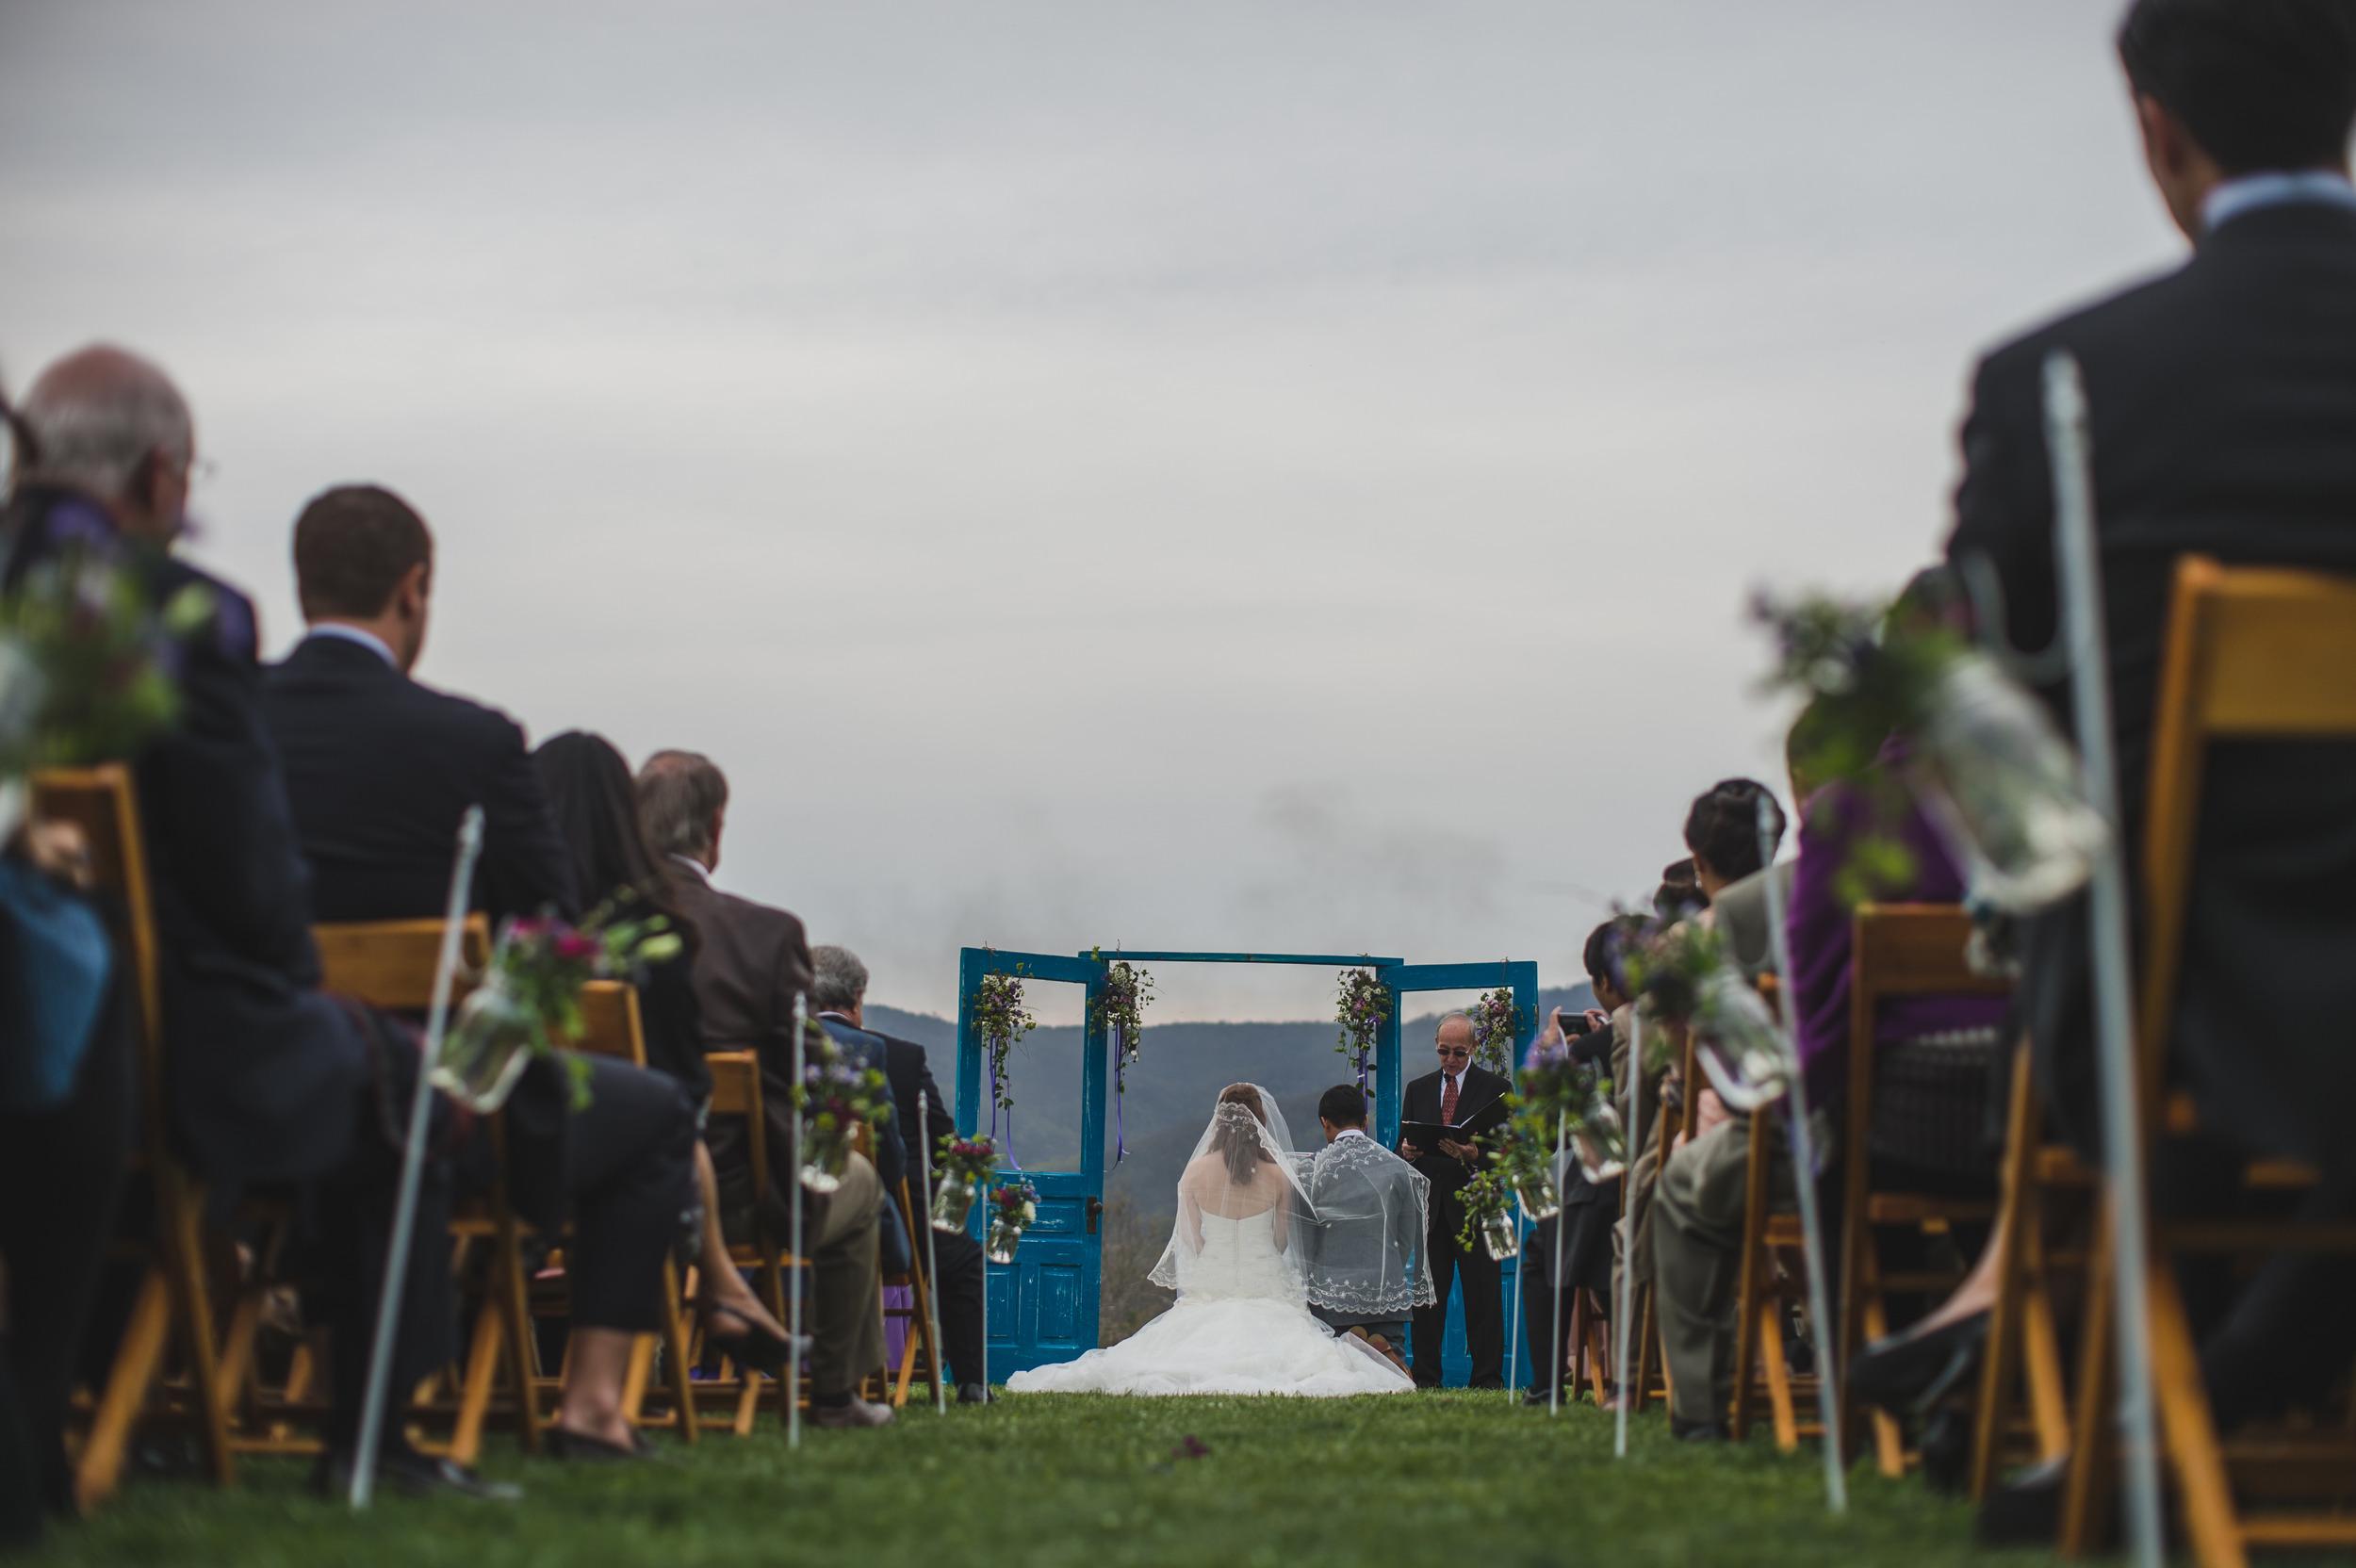 Photojournalistic wedding photography Baltimore MD By Mantas Kubilinskas-18.jpg